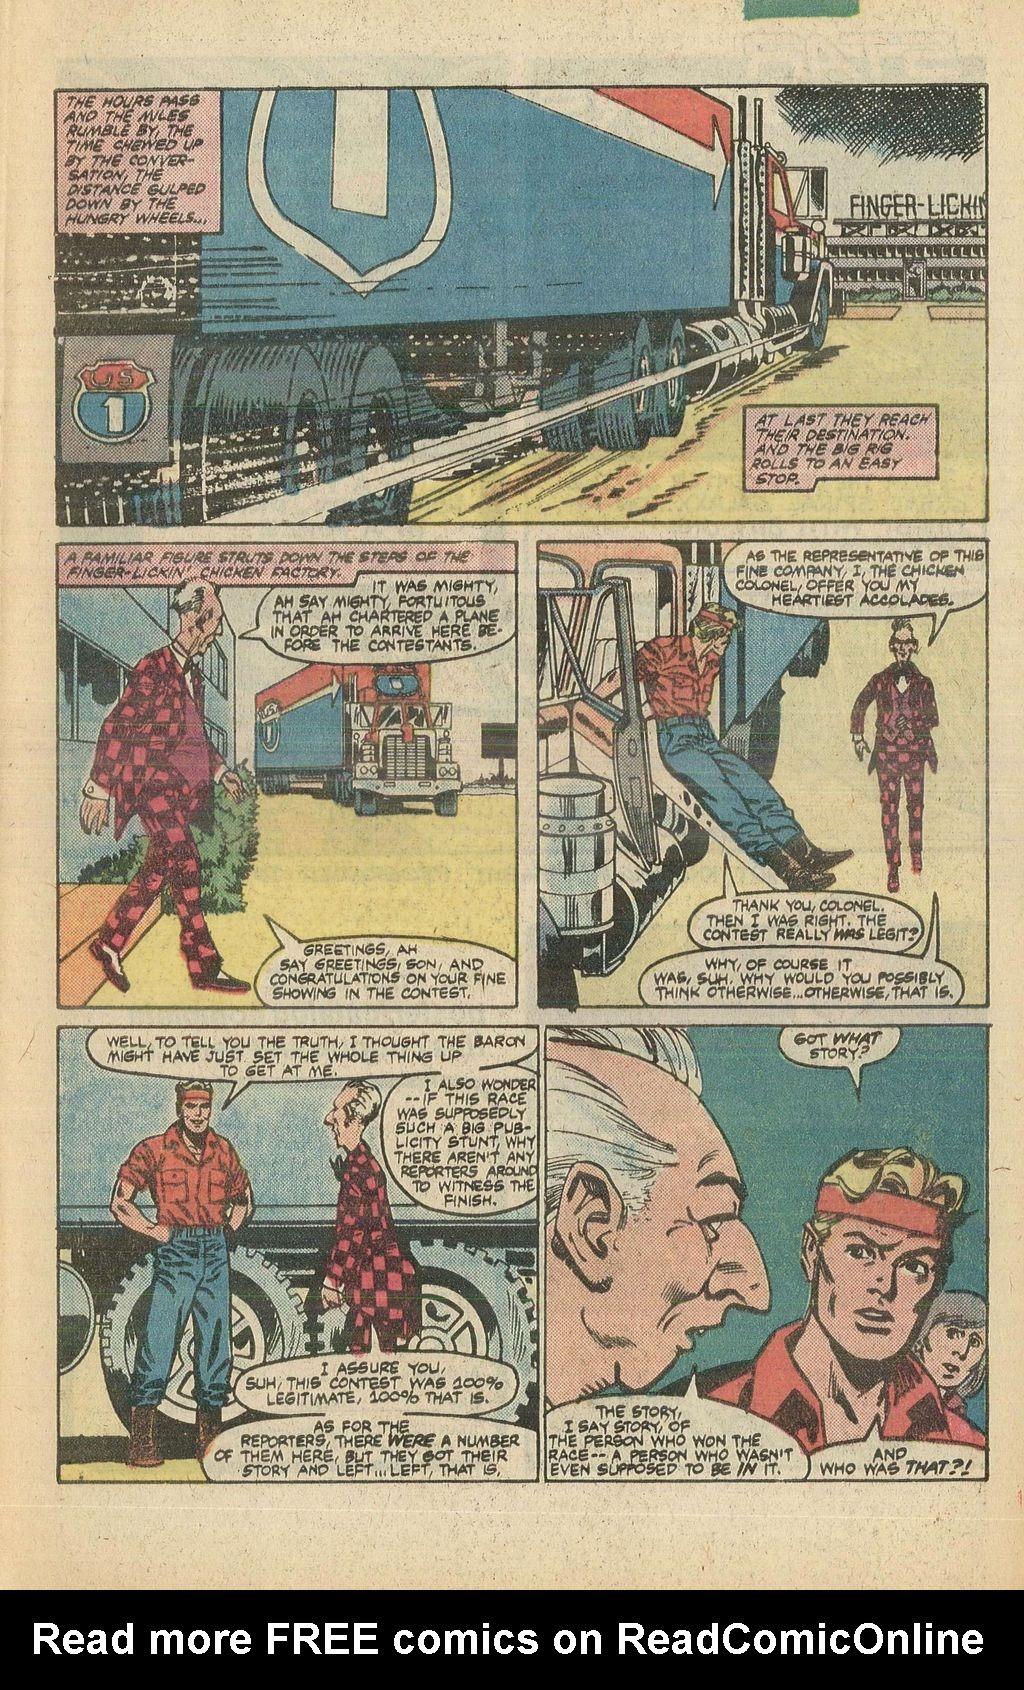 Read online U.S. 1 comic -  Issue #5 - 5